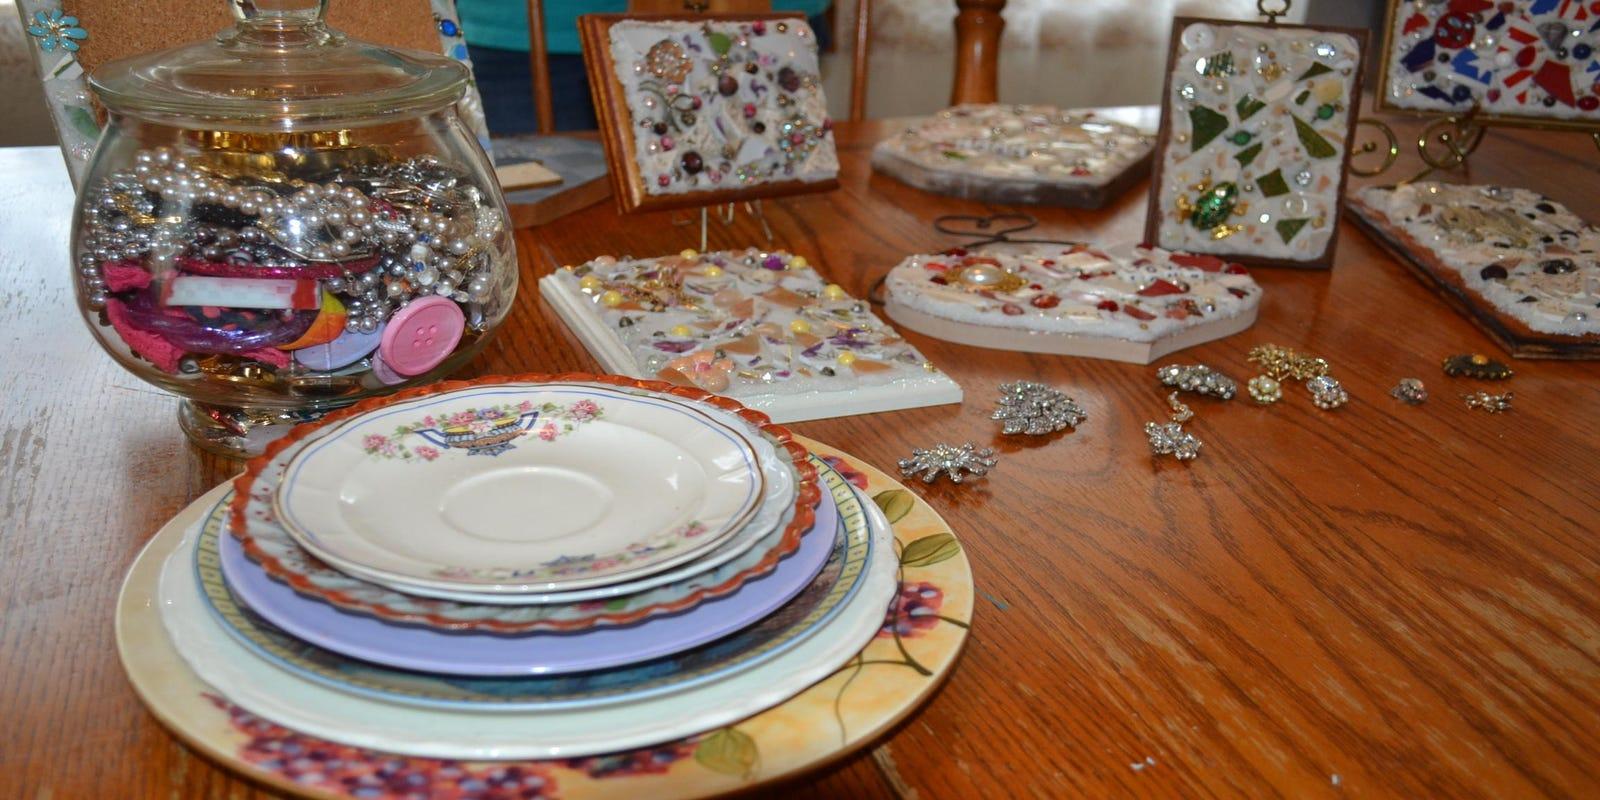 Teen Turns Great Grandma S Broken Plate Into Mosaic